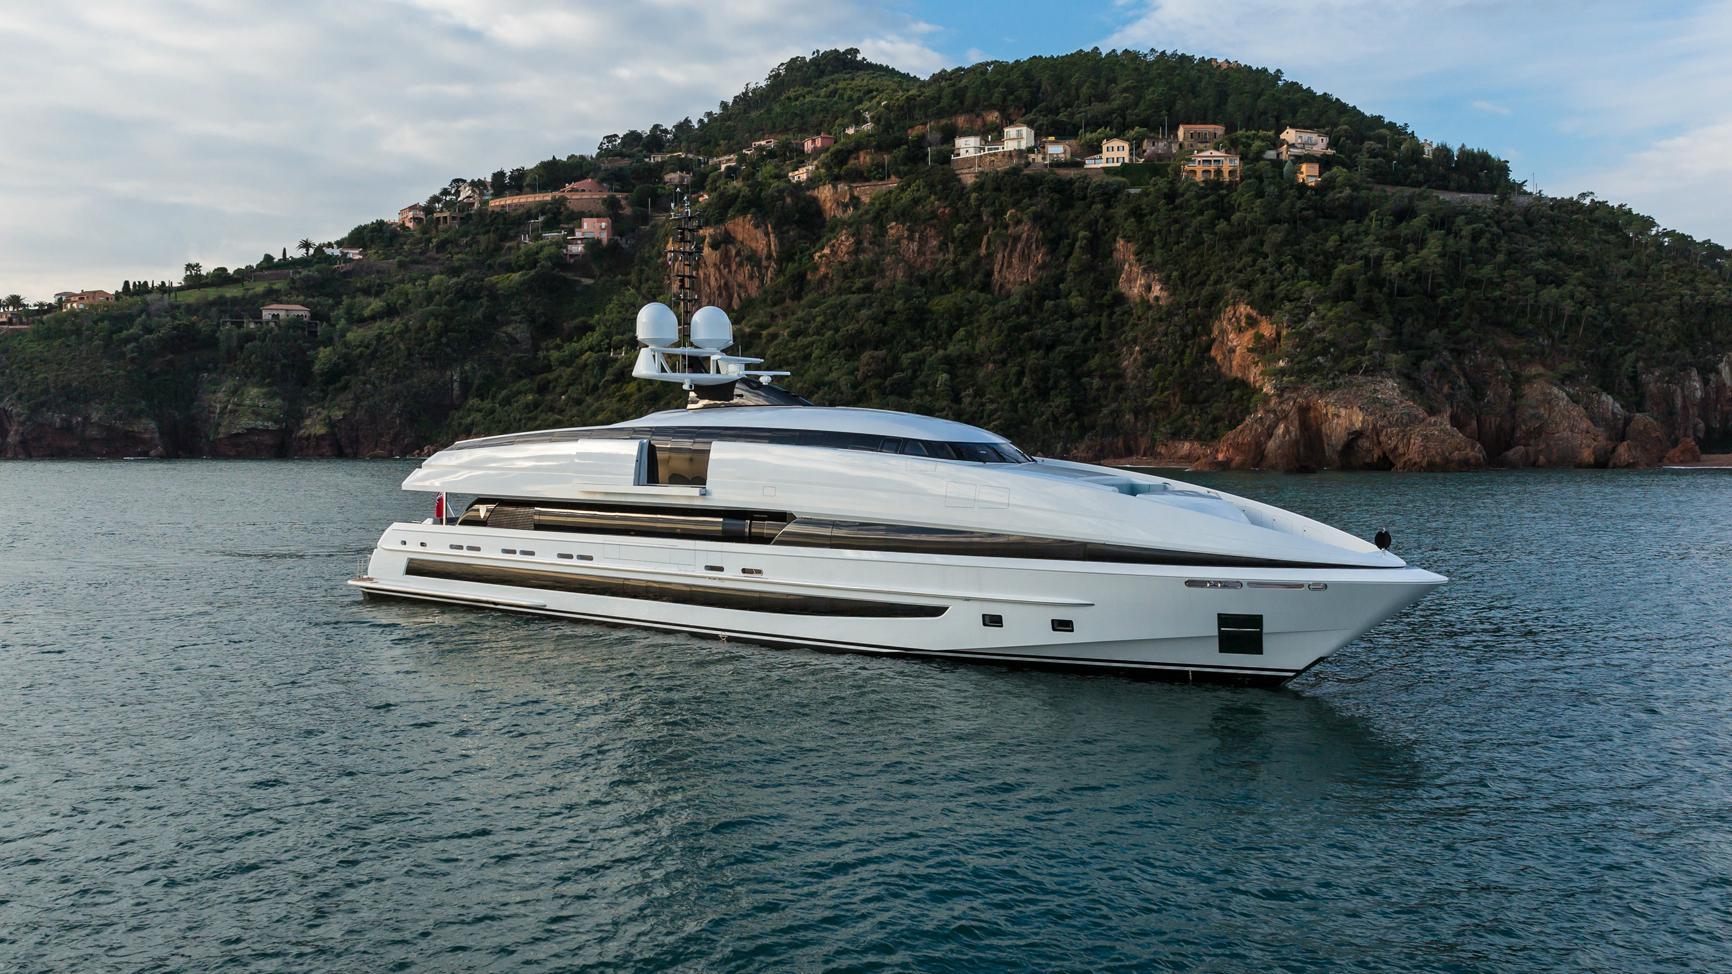 crazy-me-motor-yacht-heesen-2013-50m-profile